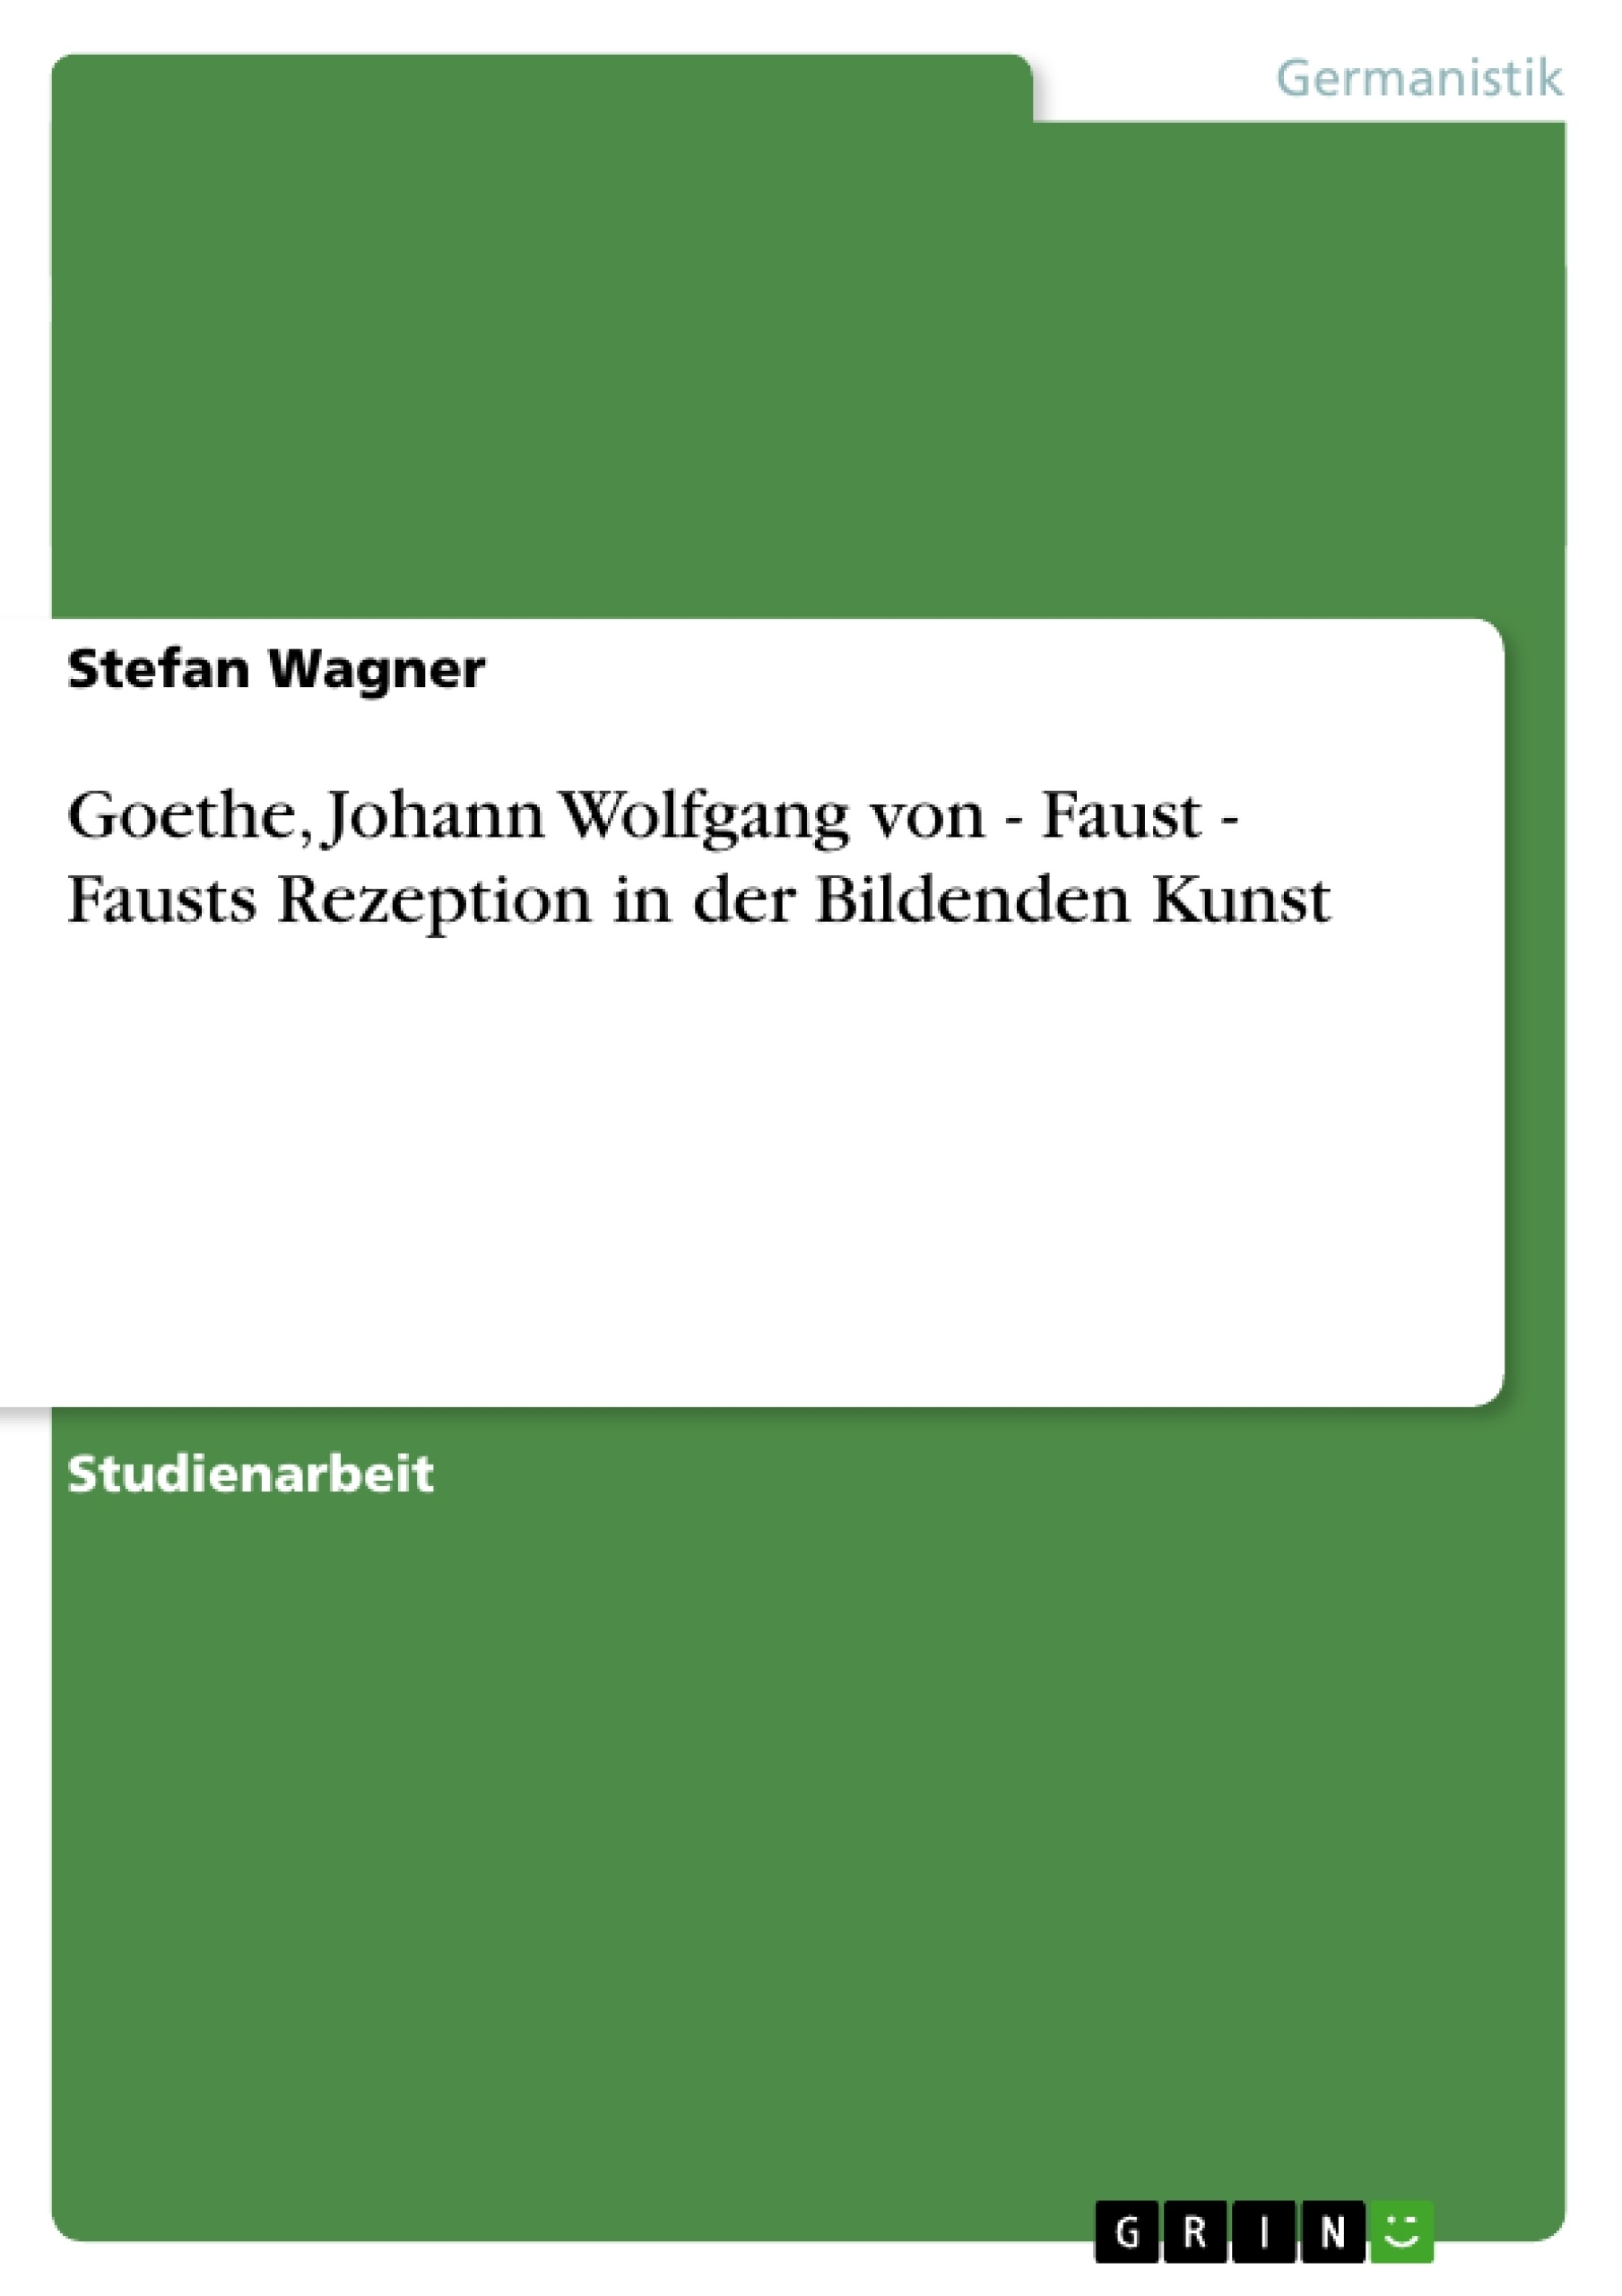 Titel: Goethe, Johann Wolfgang von - Faust - Fausts Rezeption in der Bildenden Kunst